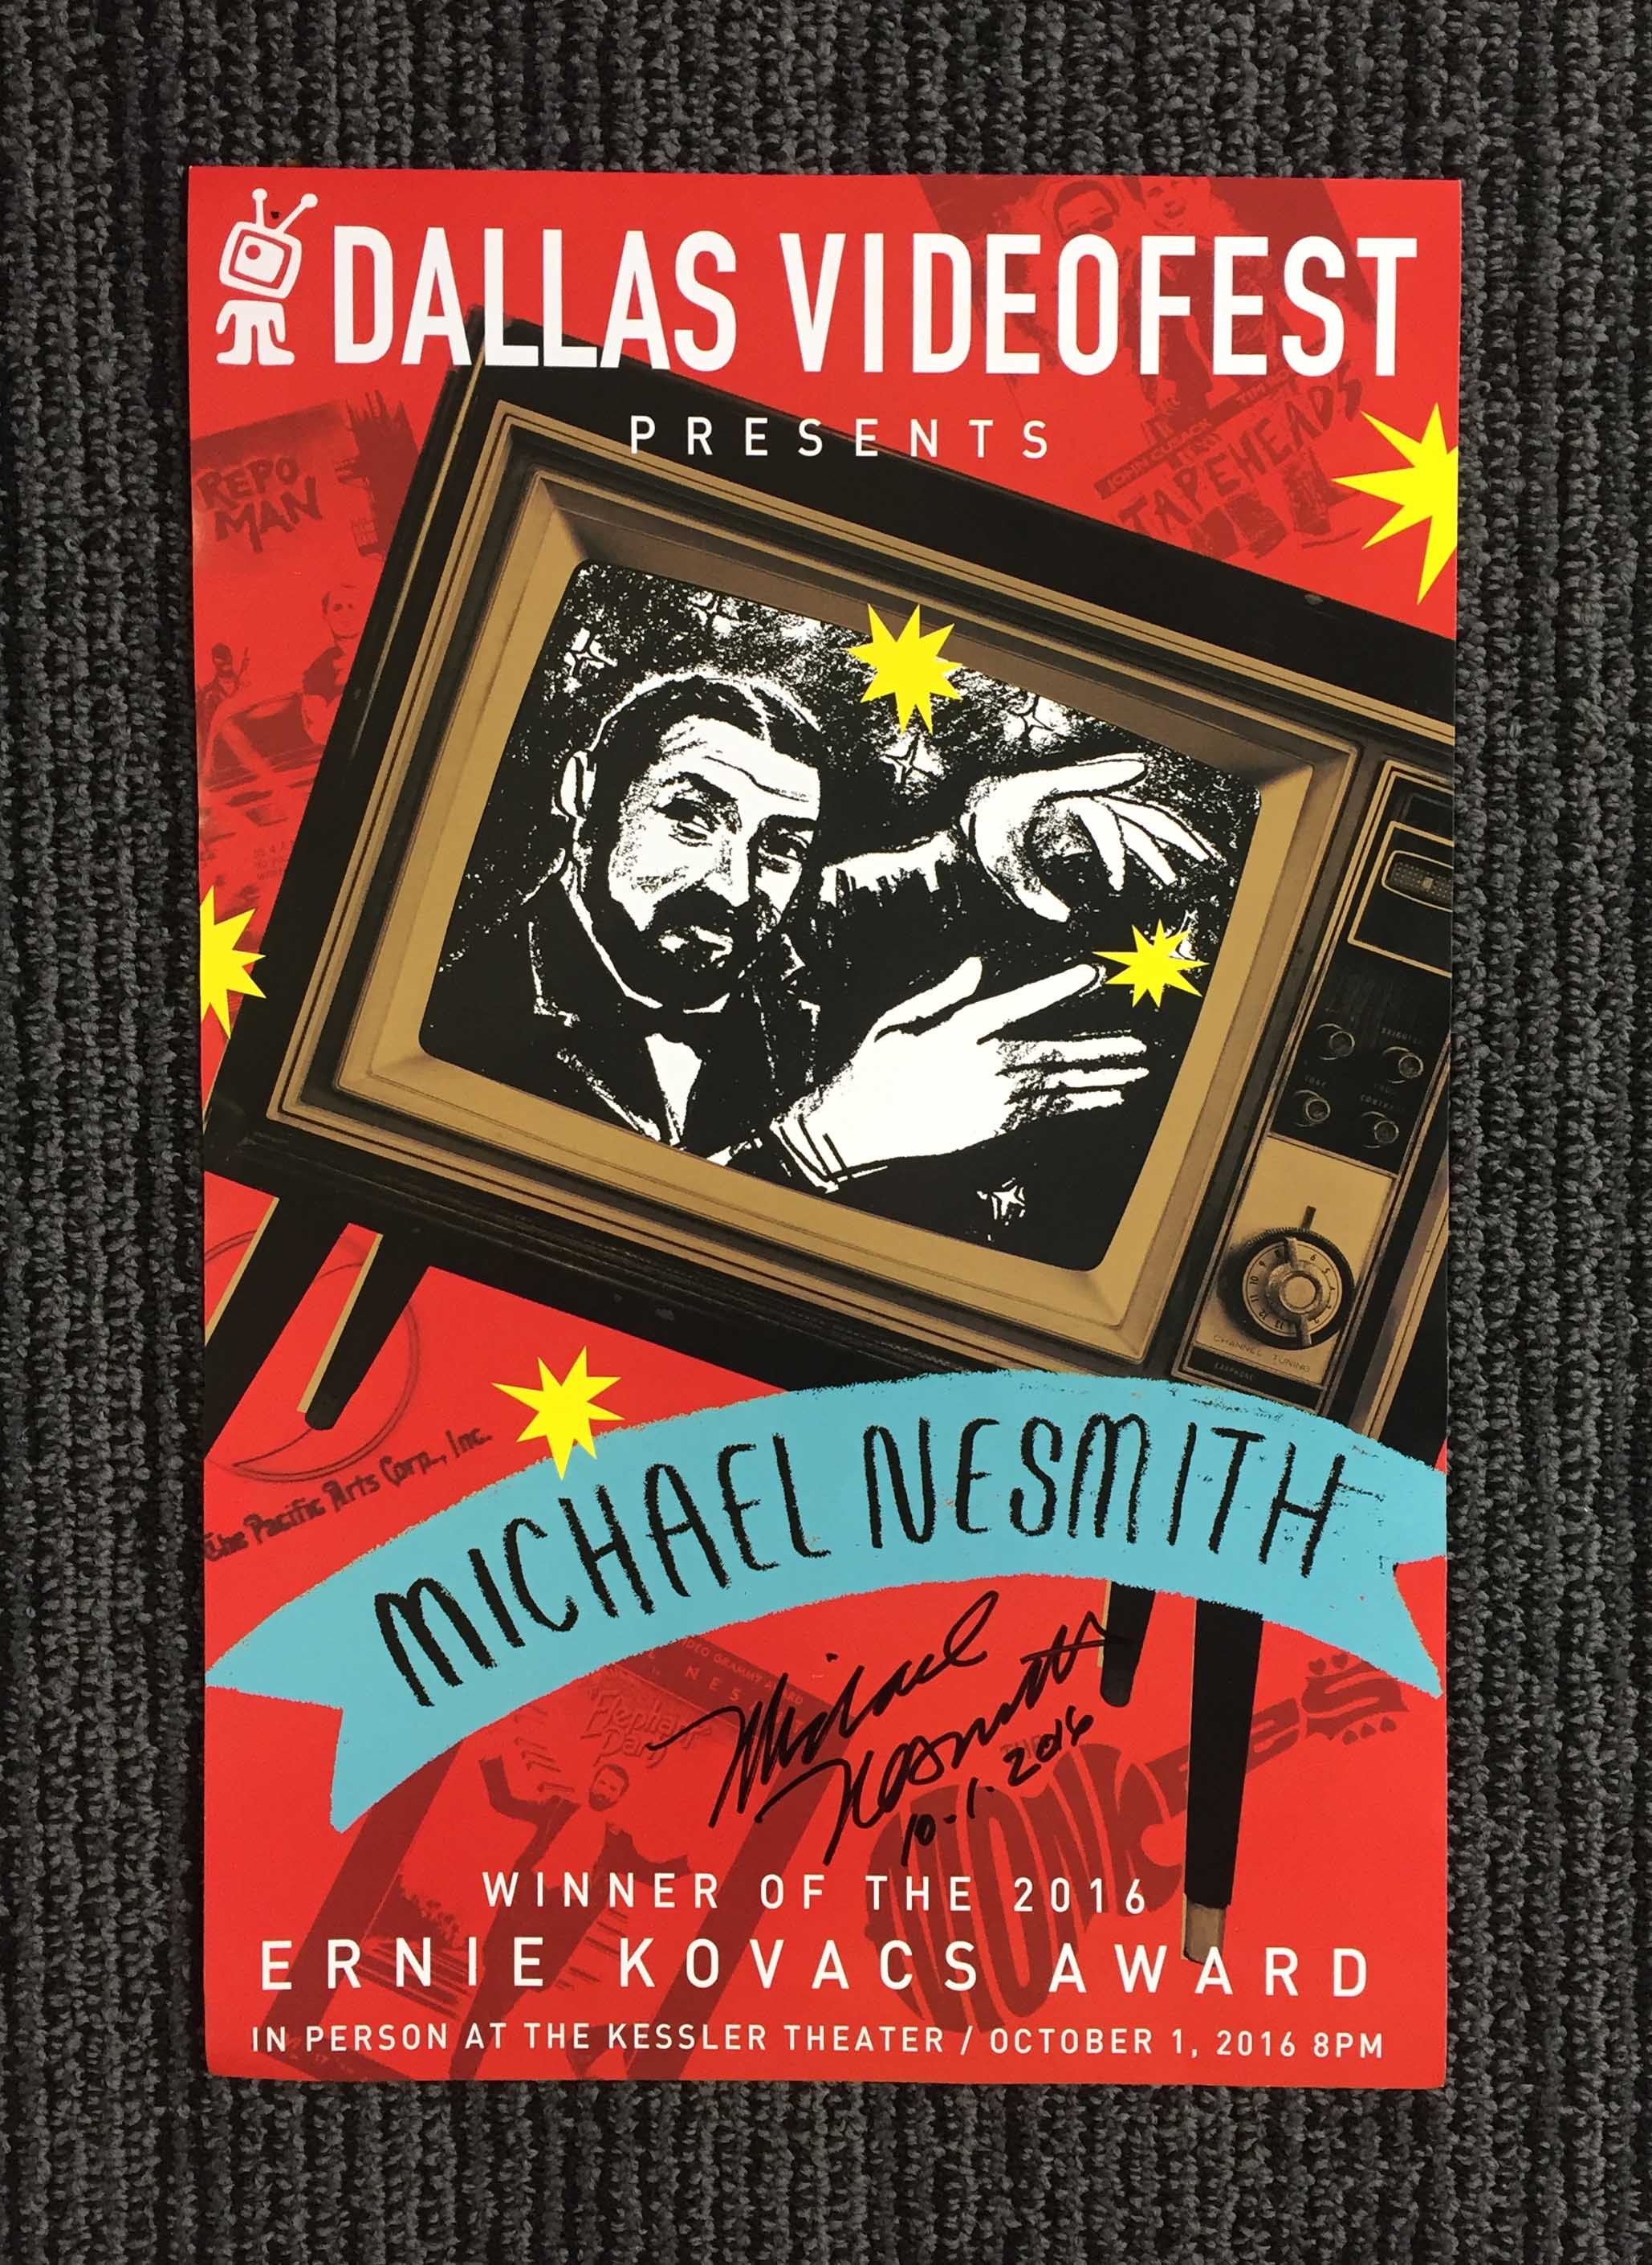 Dallas Videofest   Michael Nesmith   Ernie Kovacs Award